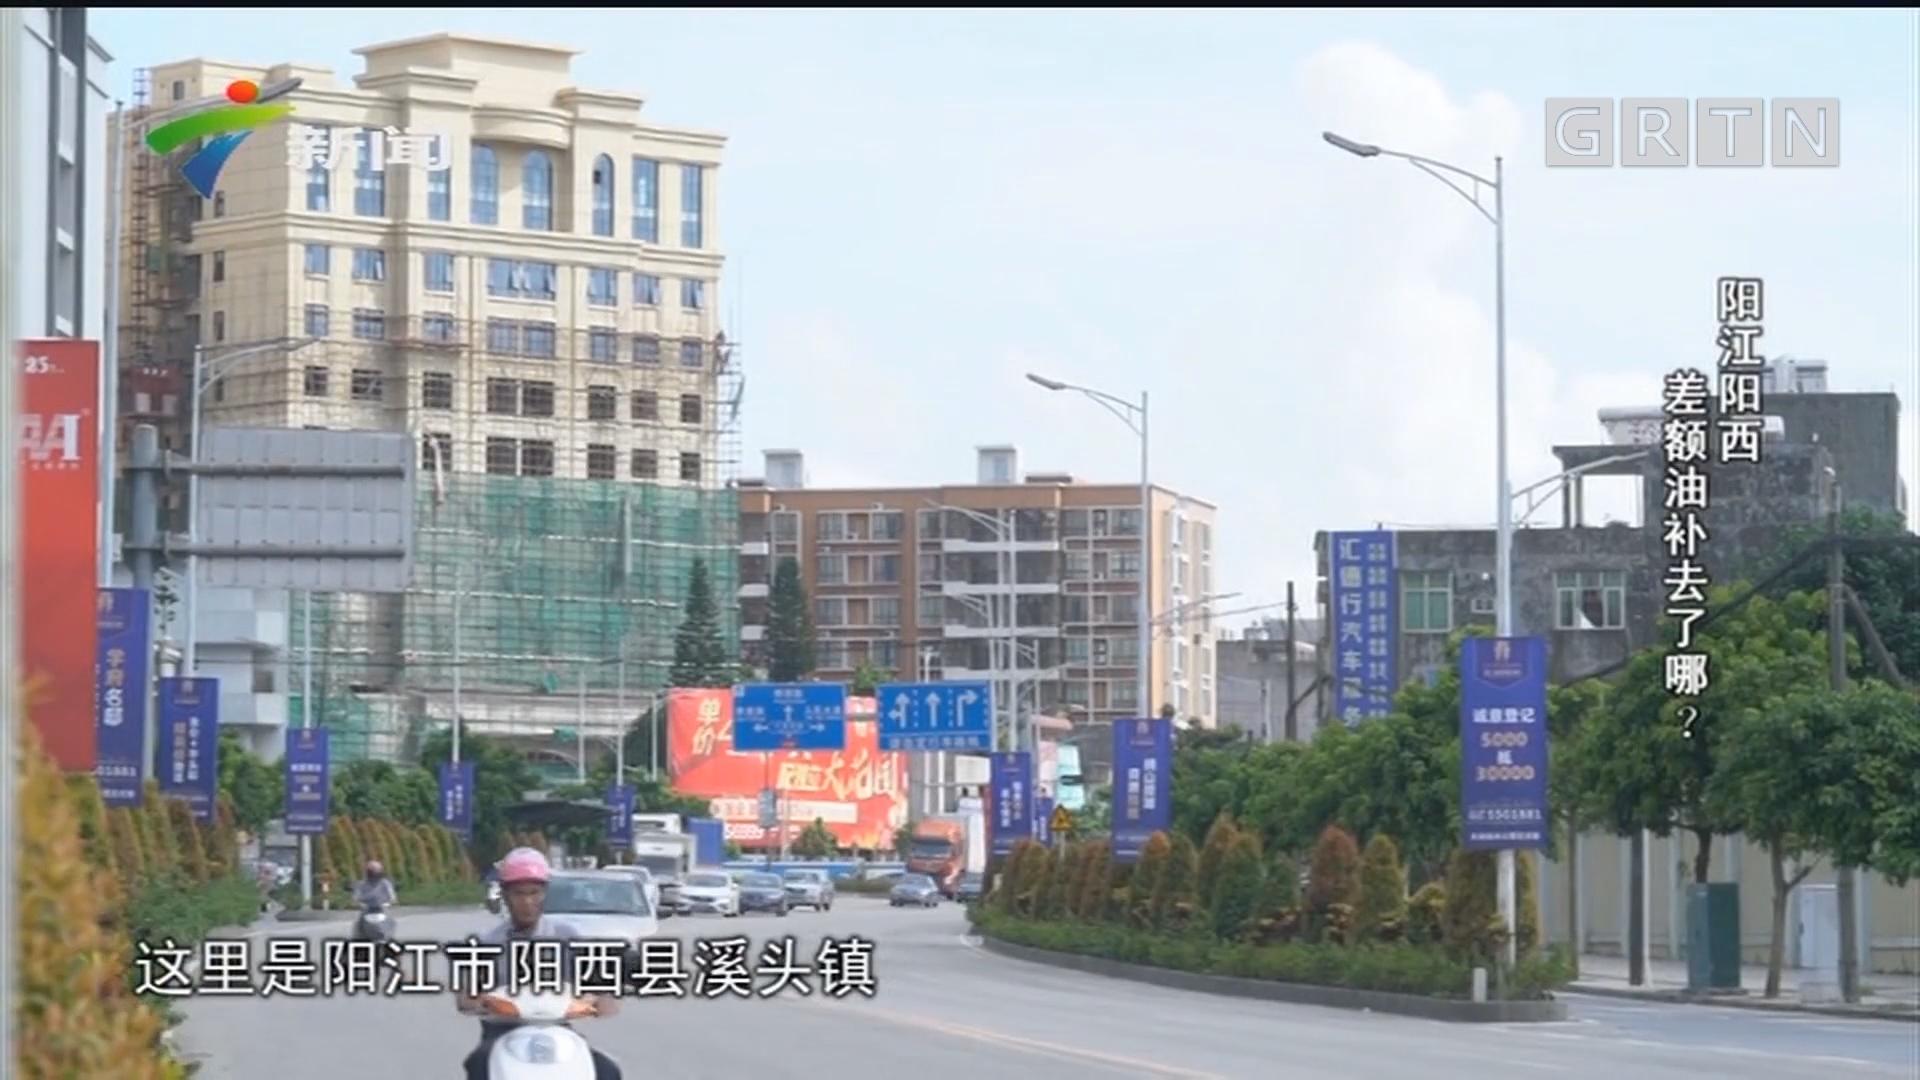 [HD][2019-07-08]社会纵横:阳江阳西 差额油补去了哪?